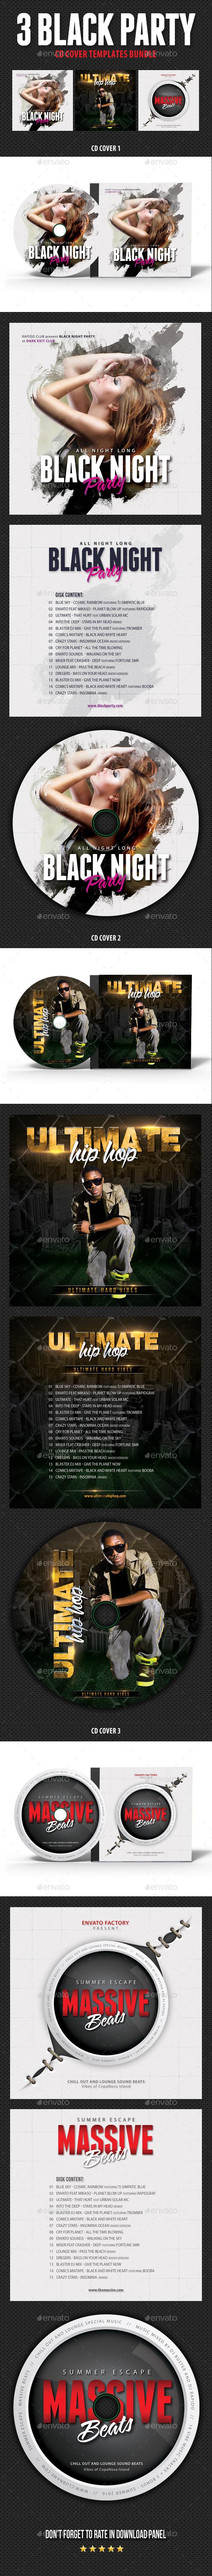 3 Black Hip Hop Party CD Cover Bundle - CD & DVD Artwork Print Templates